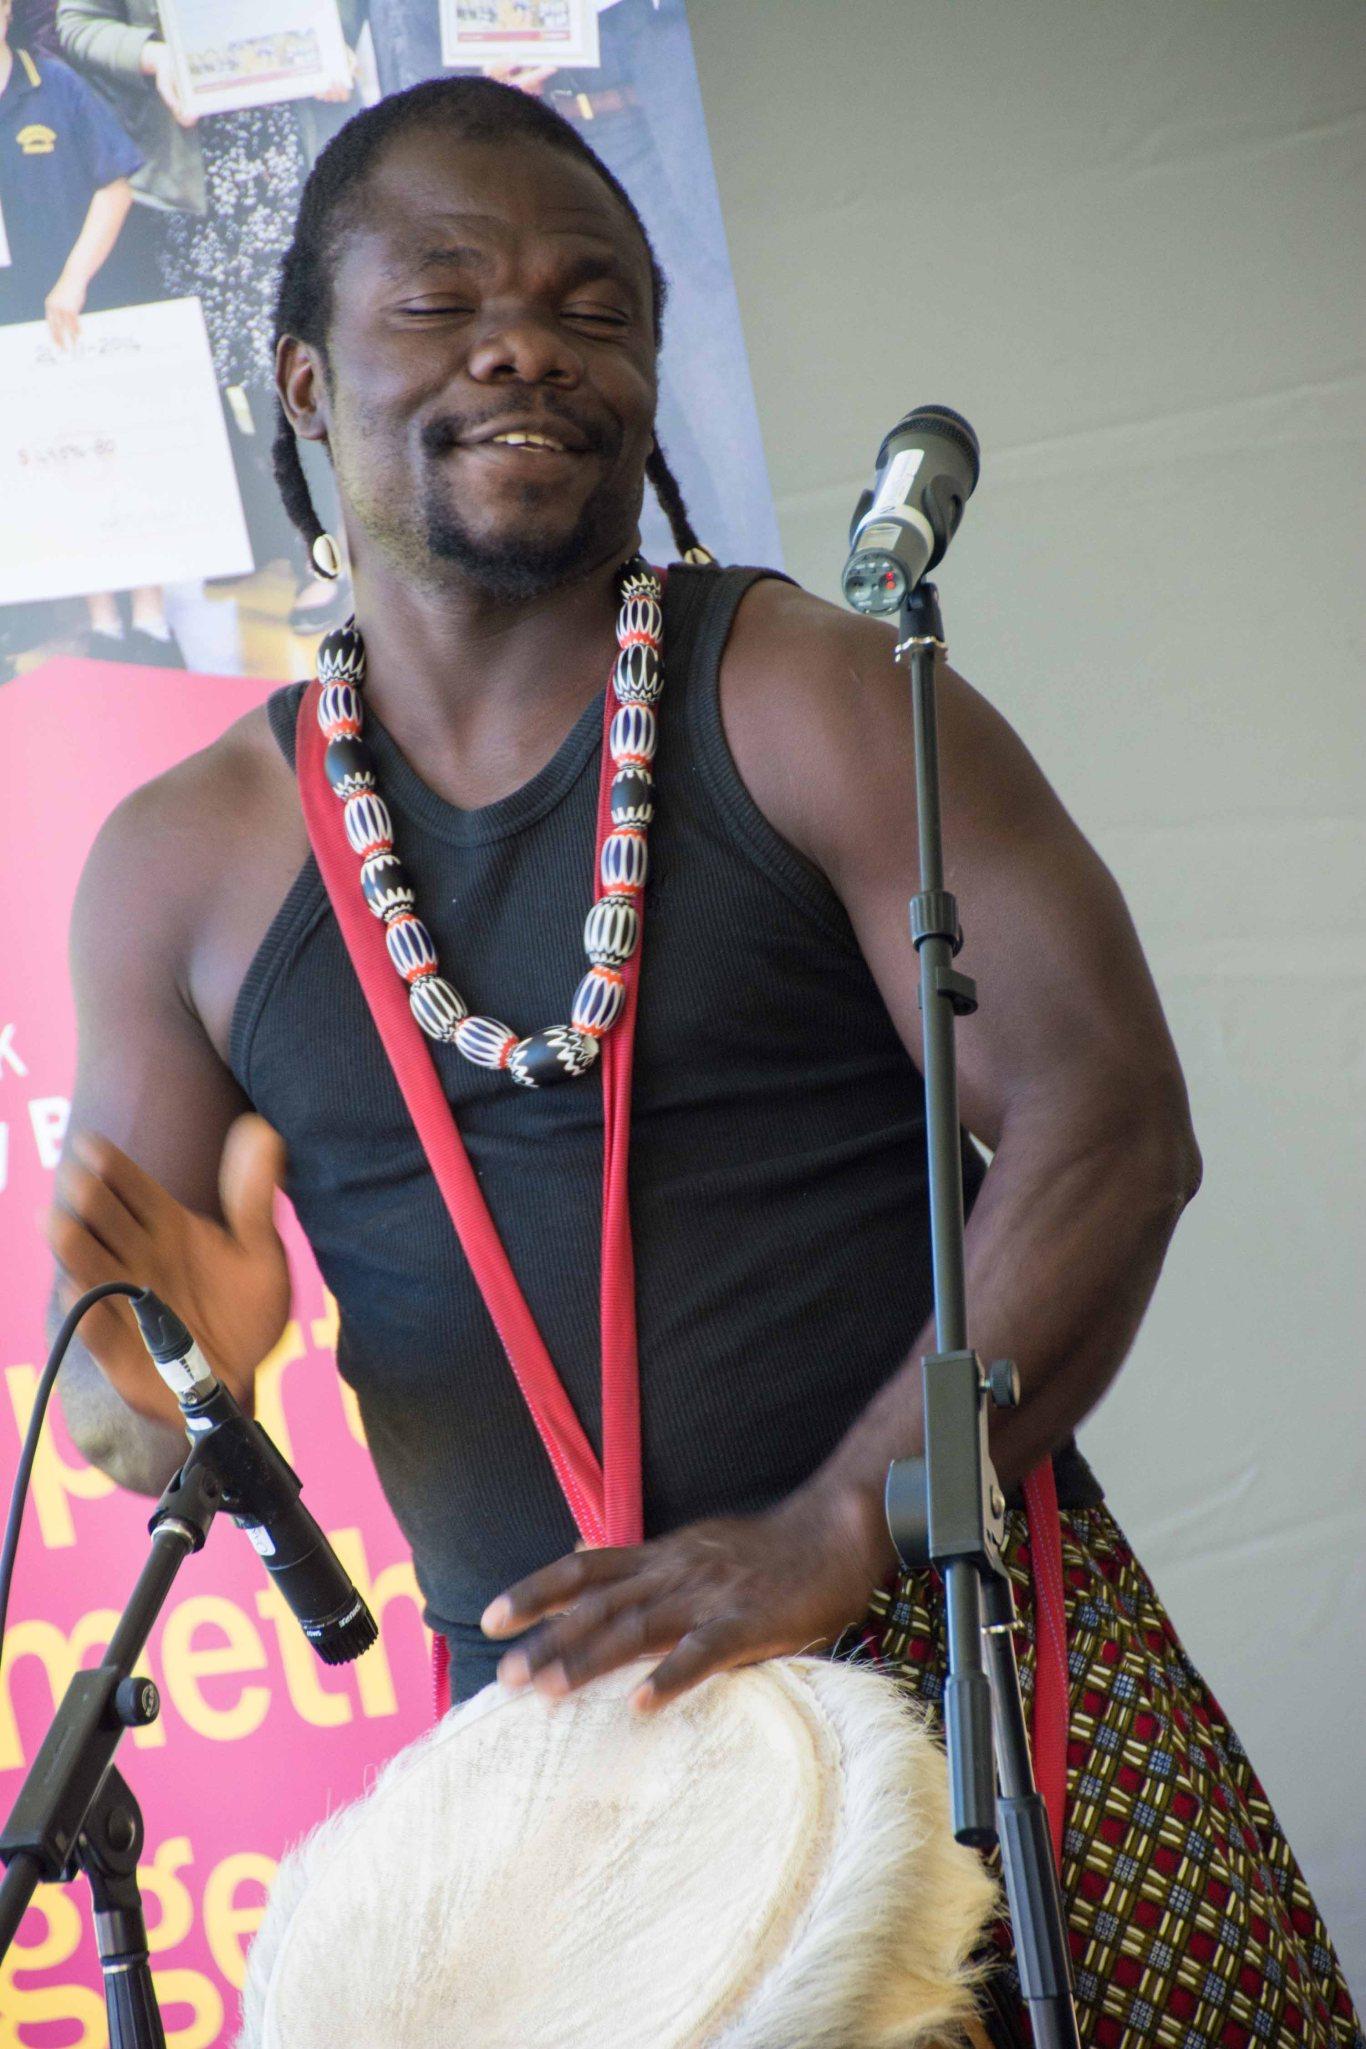 Kofi Kunkpe, Master West African Drummer. Photo by Greg Carrick.